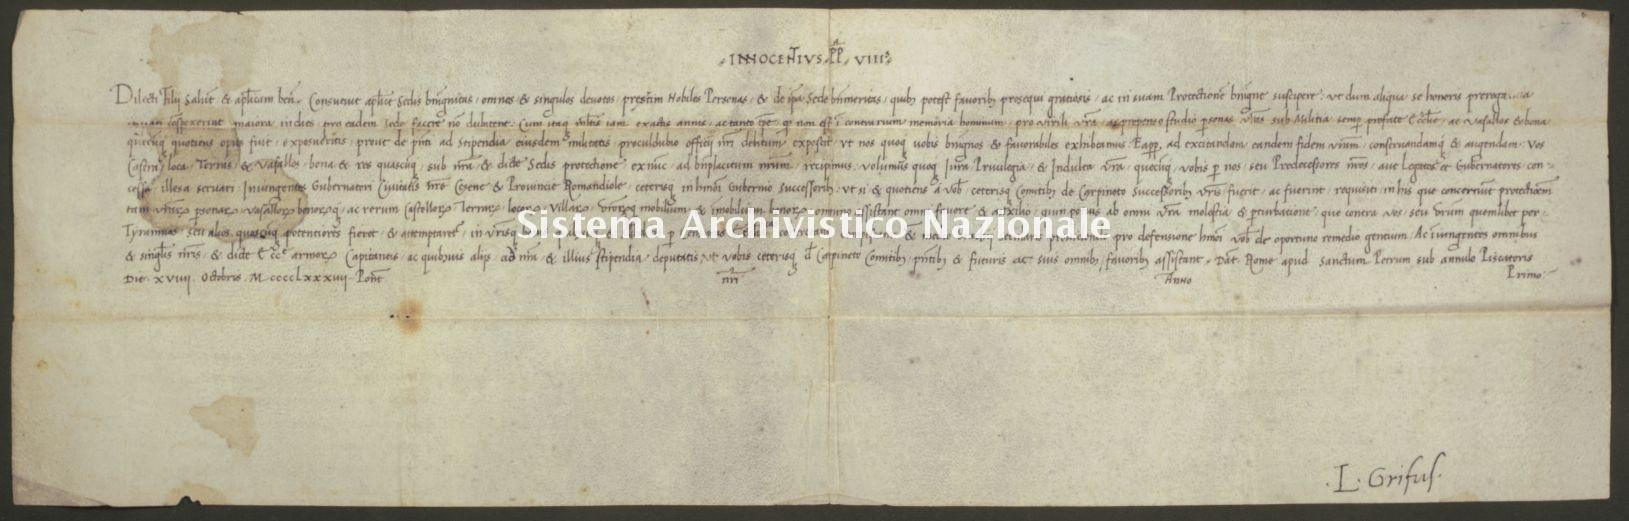 040. Carpegna Falconieri Gabrielli, Scavolino, pergamena n. 40r